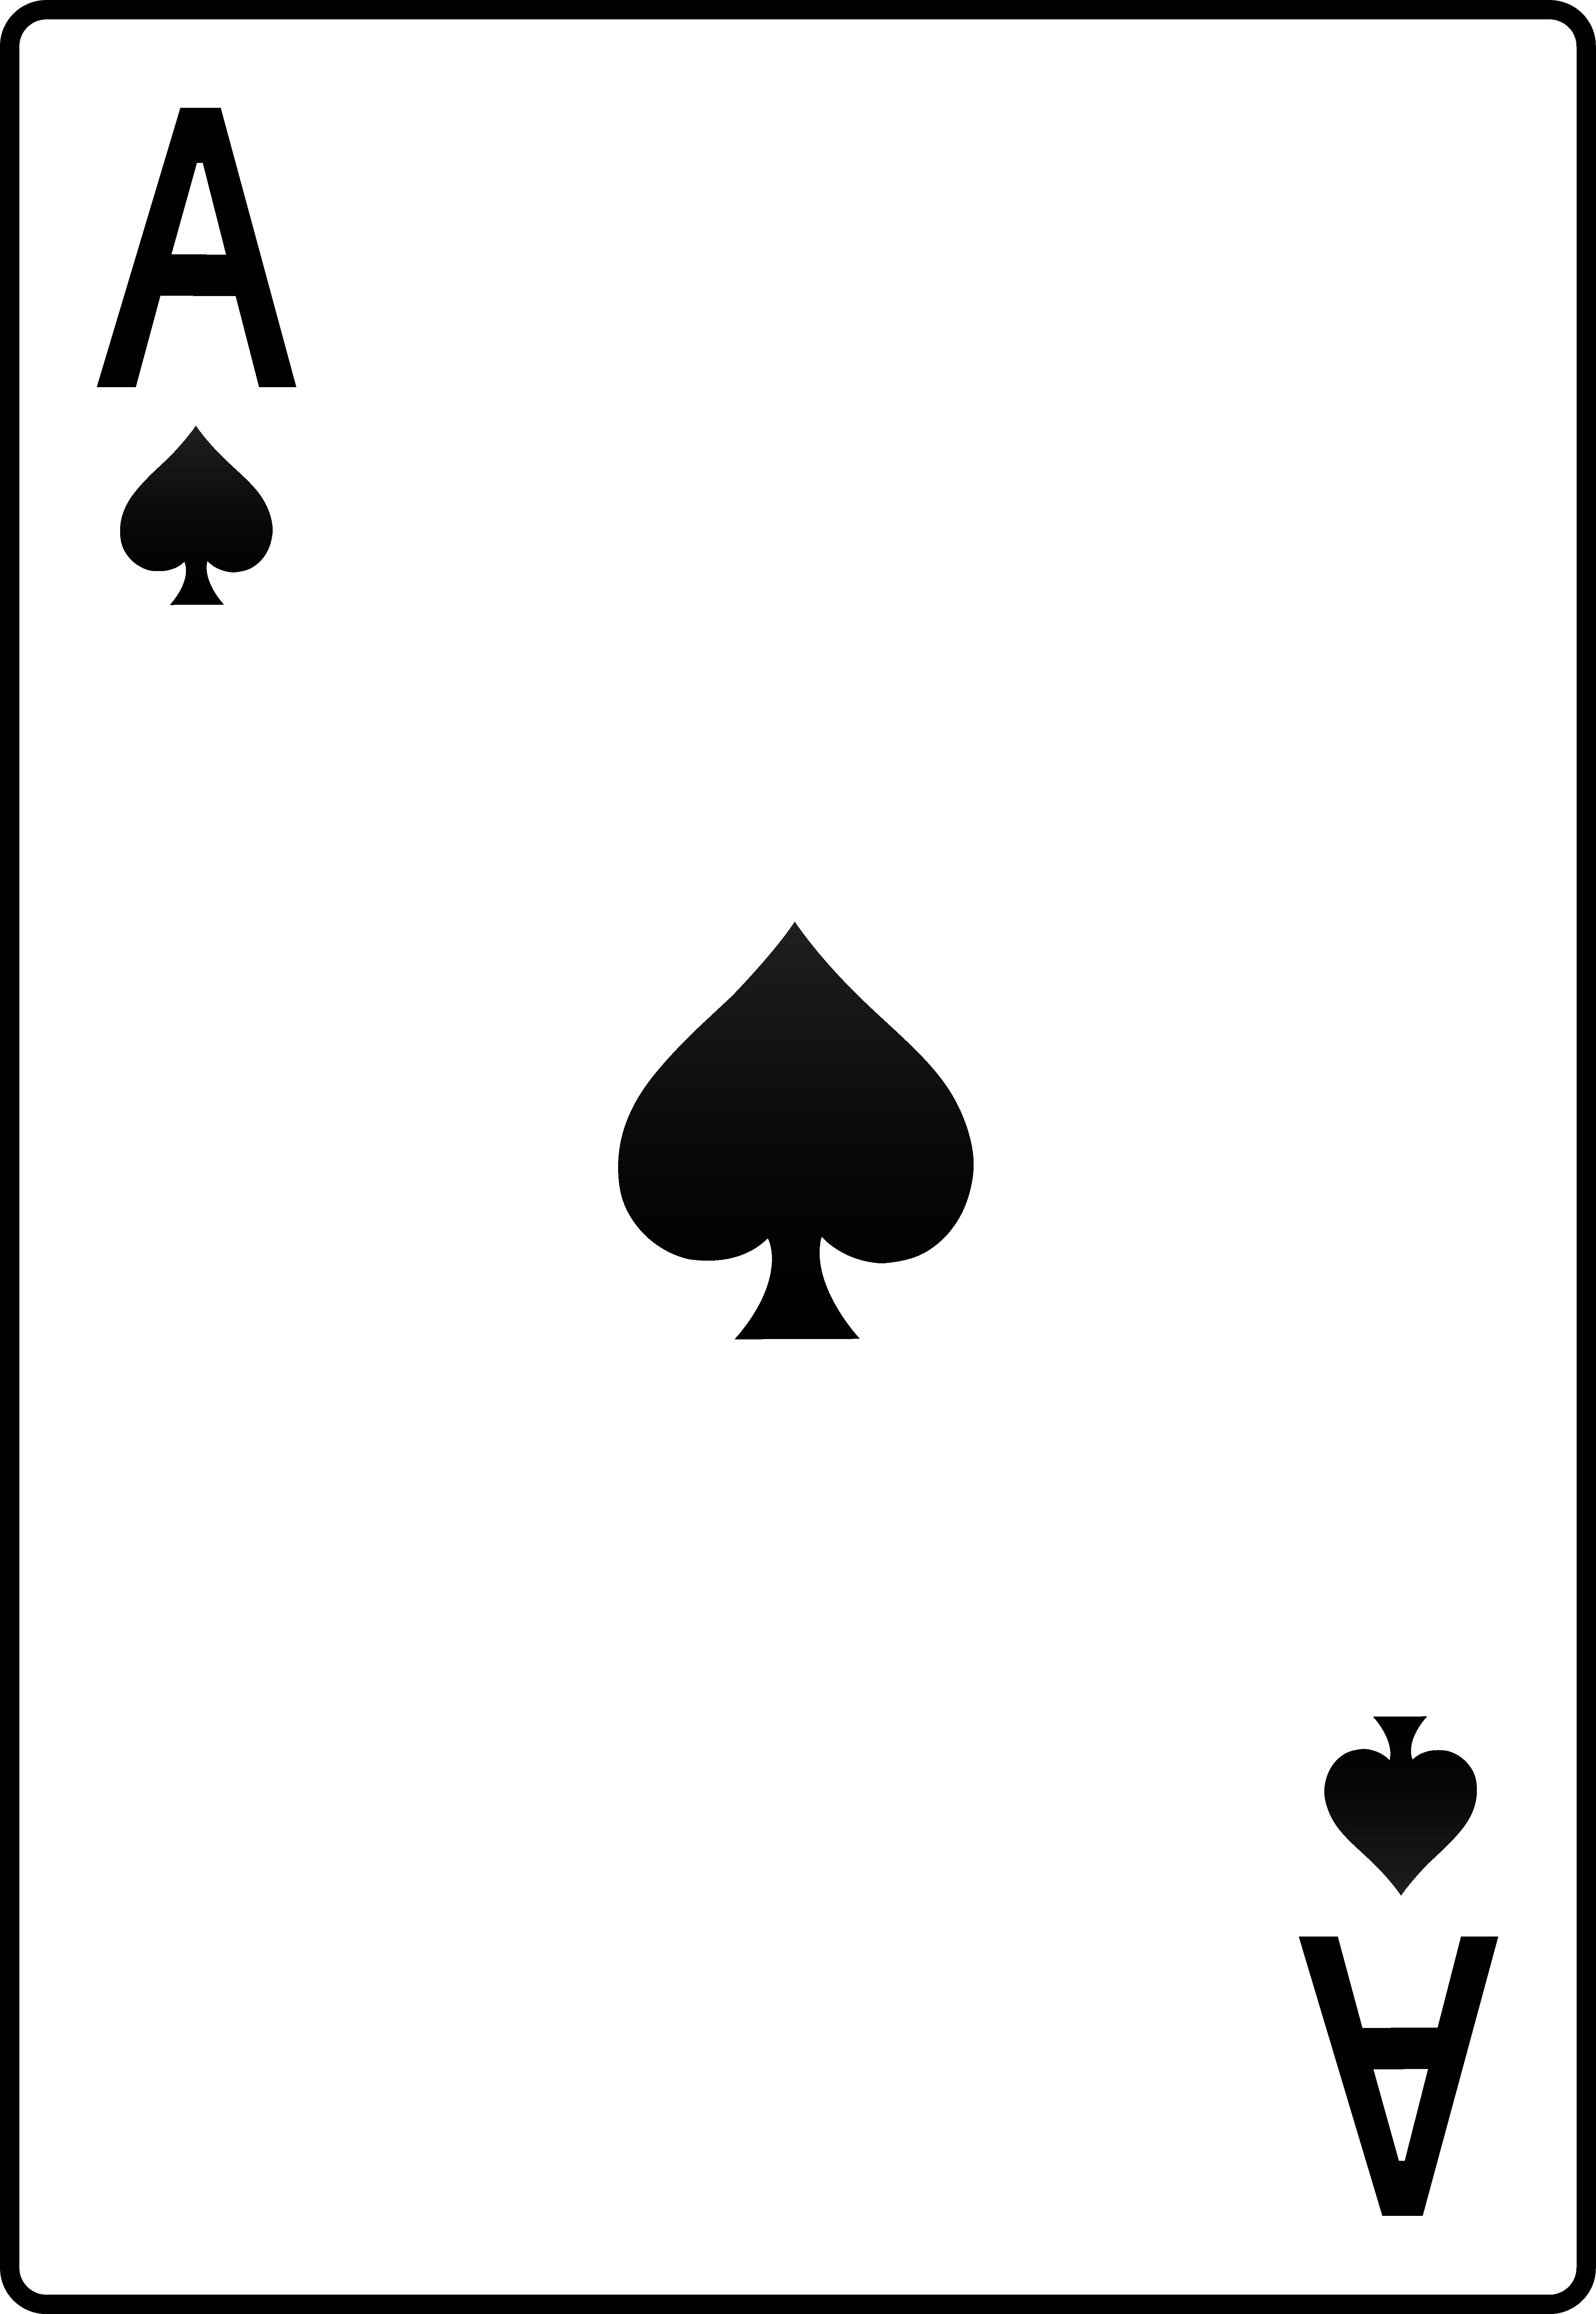 Ace Card PNG Transparent Ace Card.PNG Images. | PlusPNG